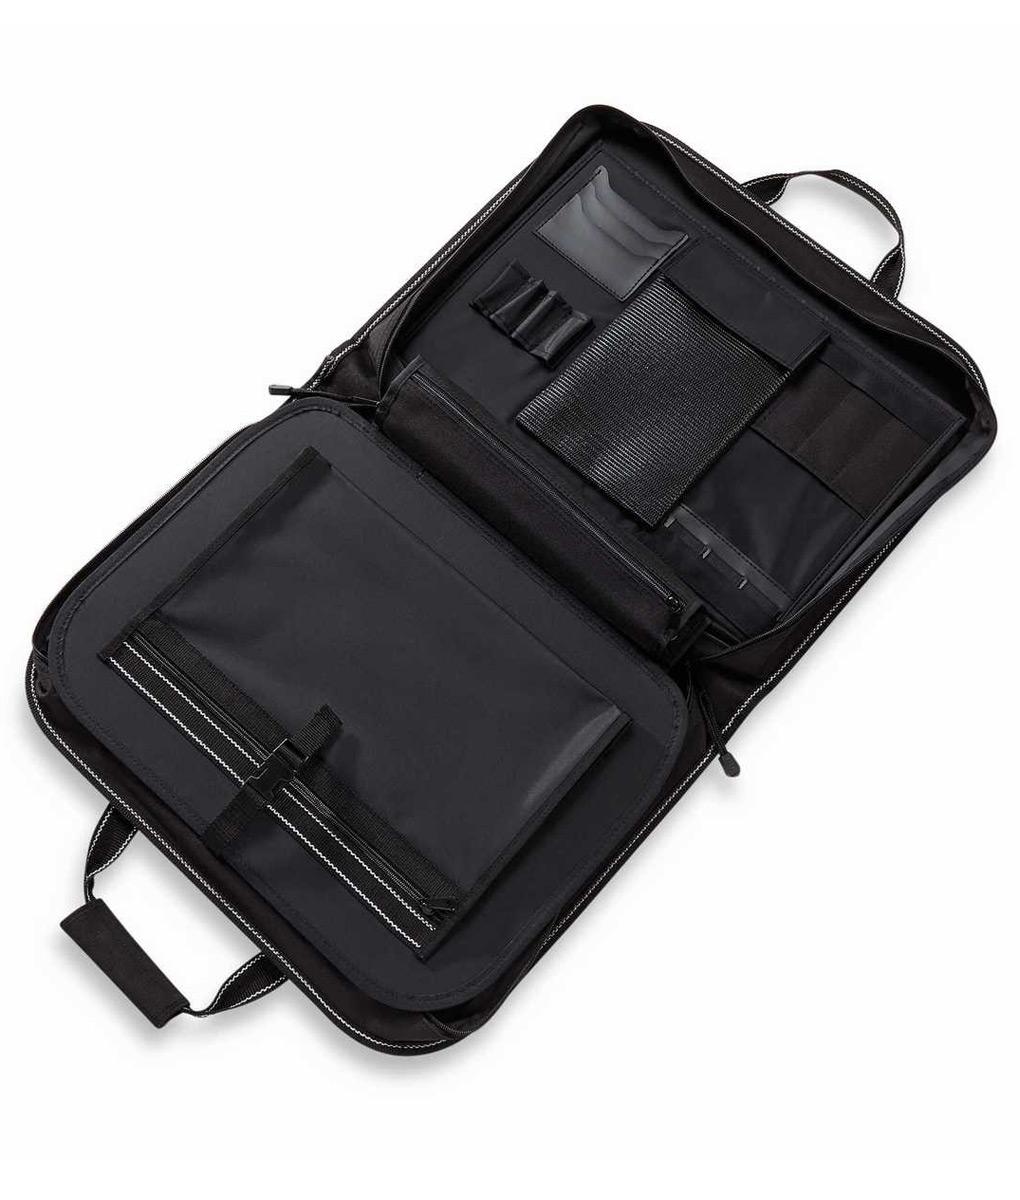 Global Professional Knife Case Cases & Storage 2